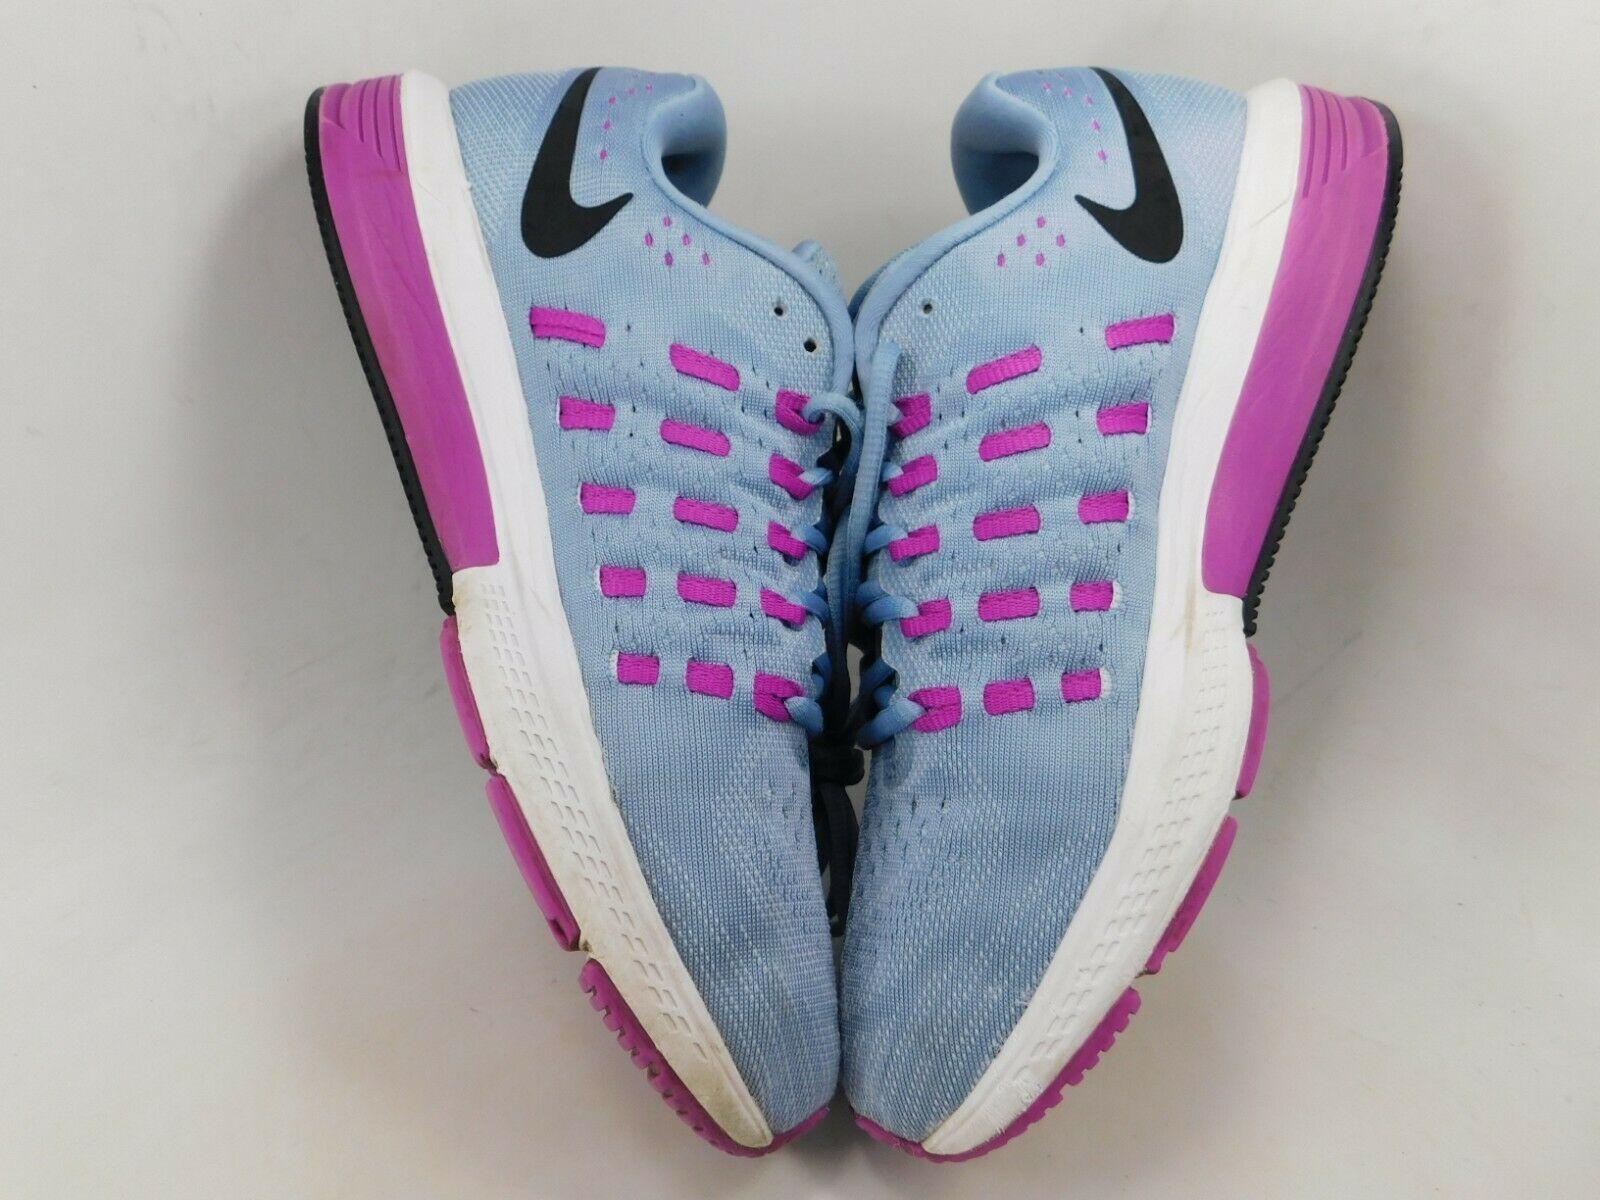 Nike Air Zoom Vomero 11 Größe 9.5 M (B) Gr. and 50 similar items